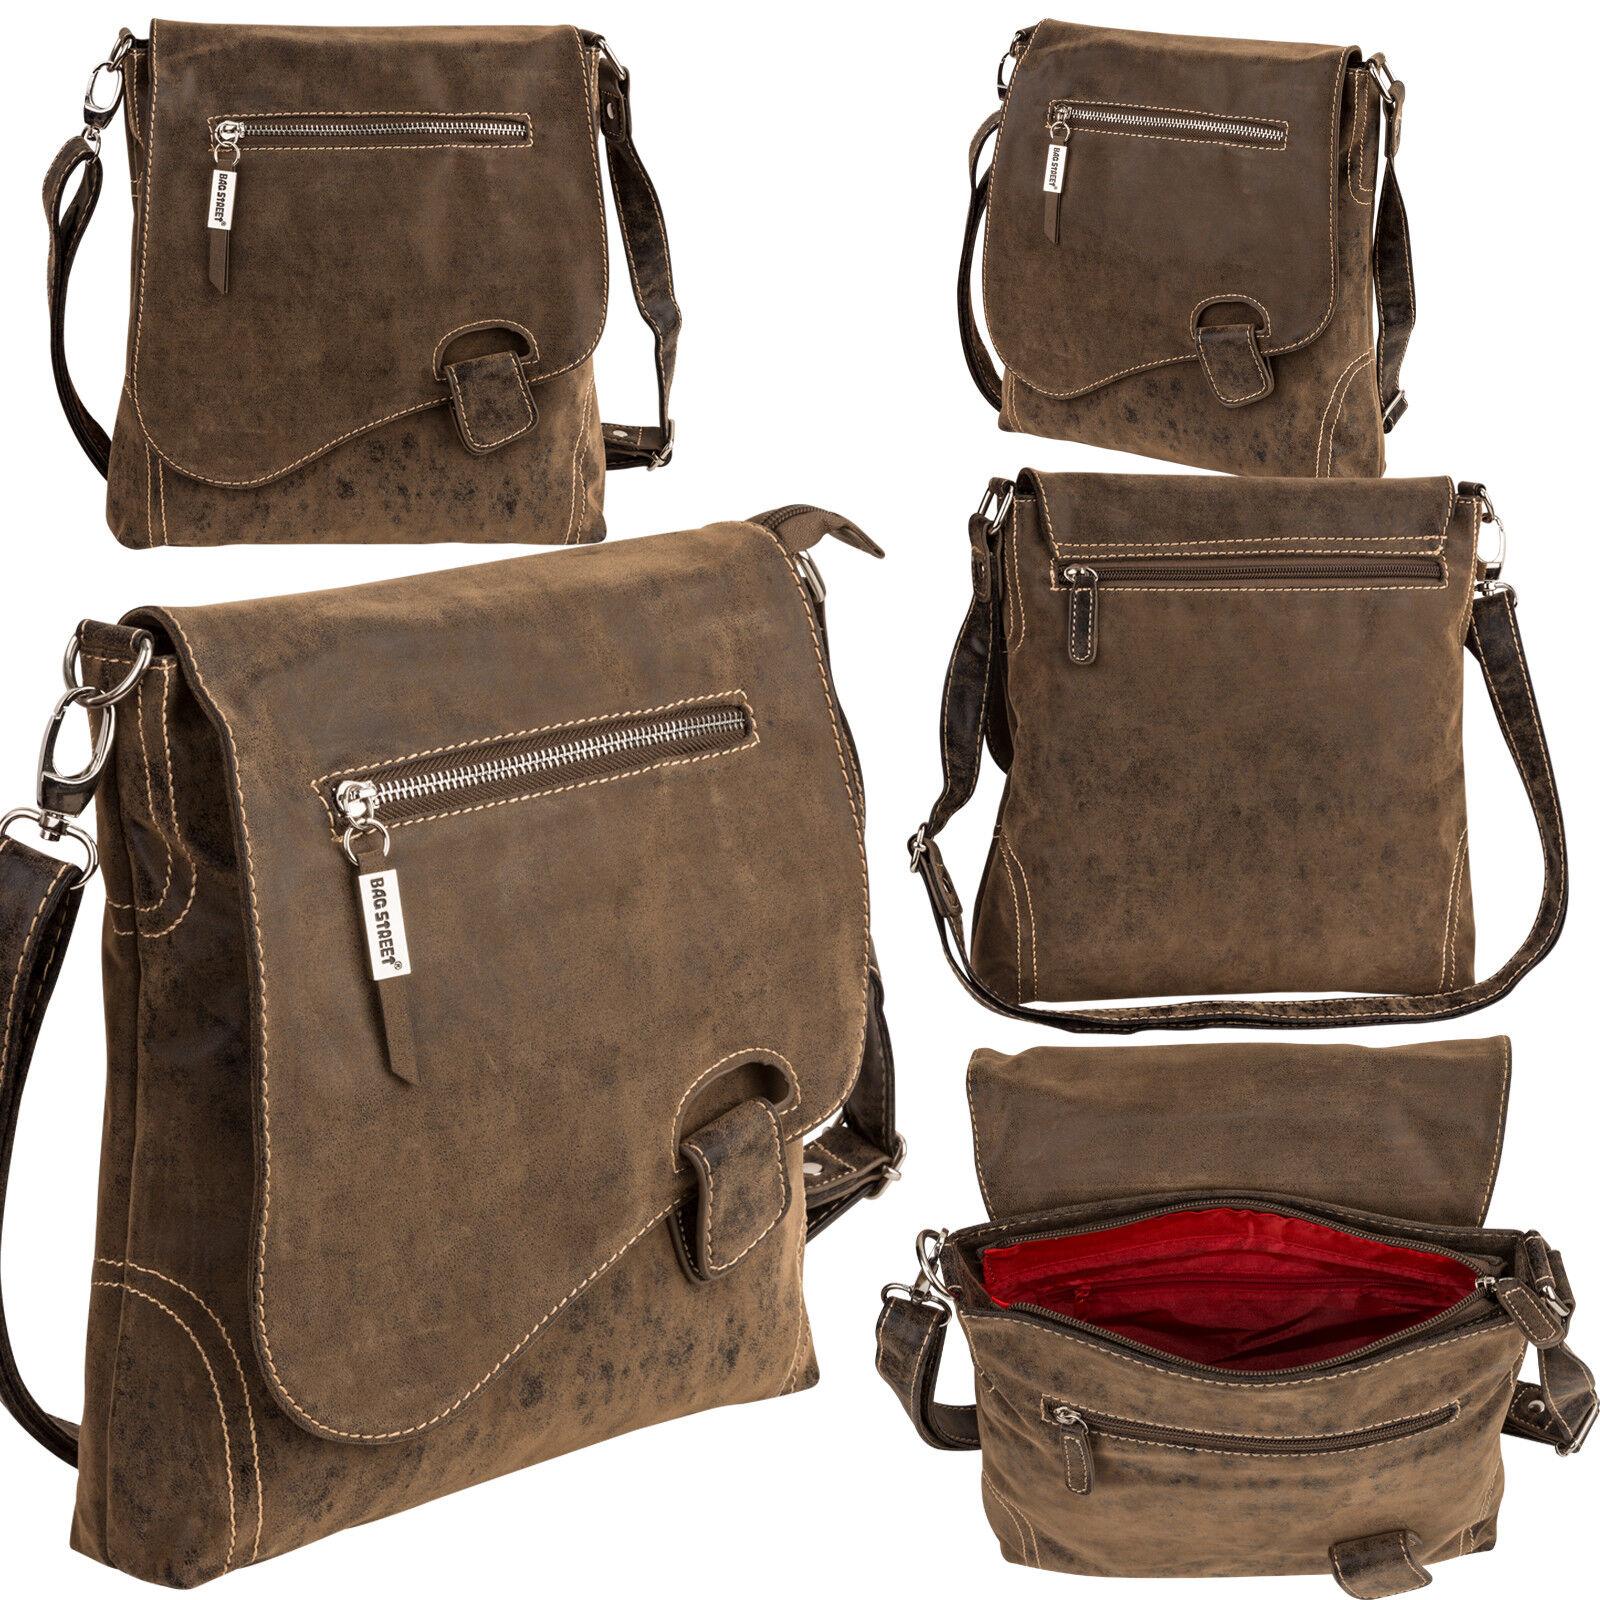 Bag Street Damentasche Umhängetasche Handtasche Schultertasche K2 T0106 Antikbraun